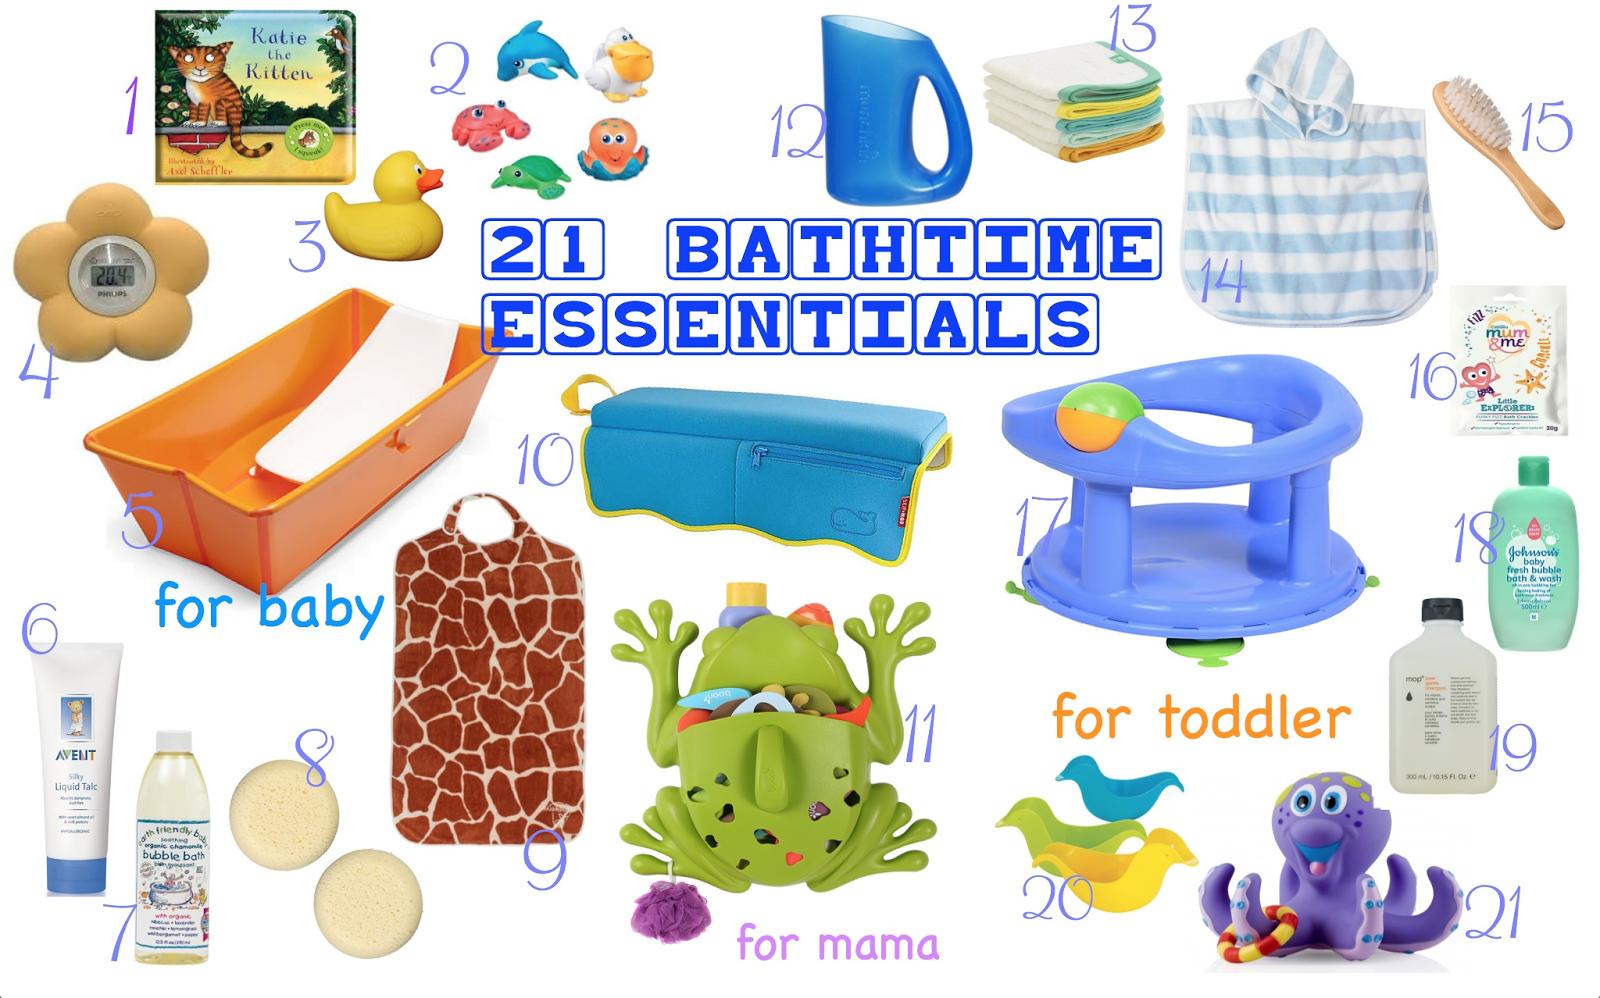 mamasVIB | V. I. BEAUTY: 21 Bathtime Essentials for babies and toddlers from £1.. | 21 Bathtime Essentials for babies and toddlers from £1 | baby bath time toddler baths | bath time essentials for babies | cheap bath time buys | mamasVIB | John Lewis baby | cuddle dry | Johnsons | Skip Hop | Munchkin bath toys | bath toys | baby bath toys | bath storage | baby beauty